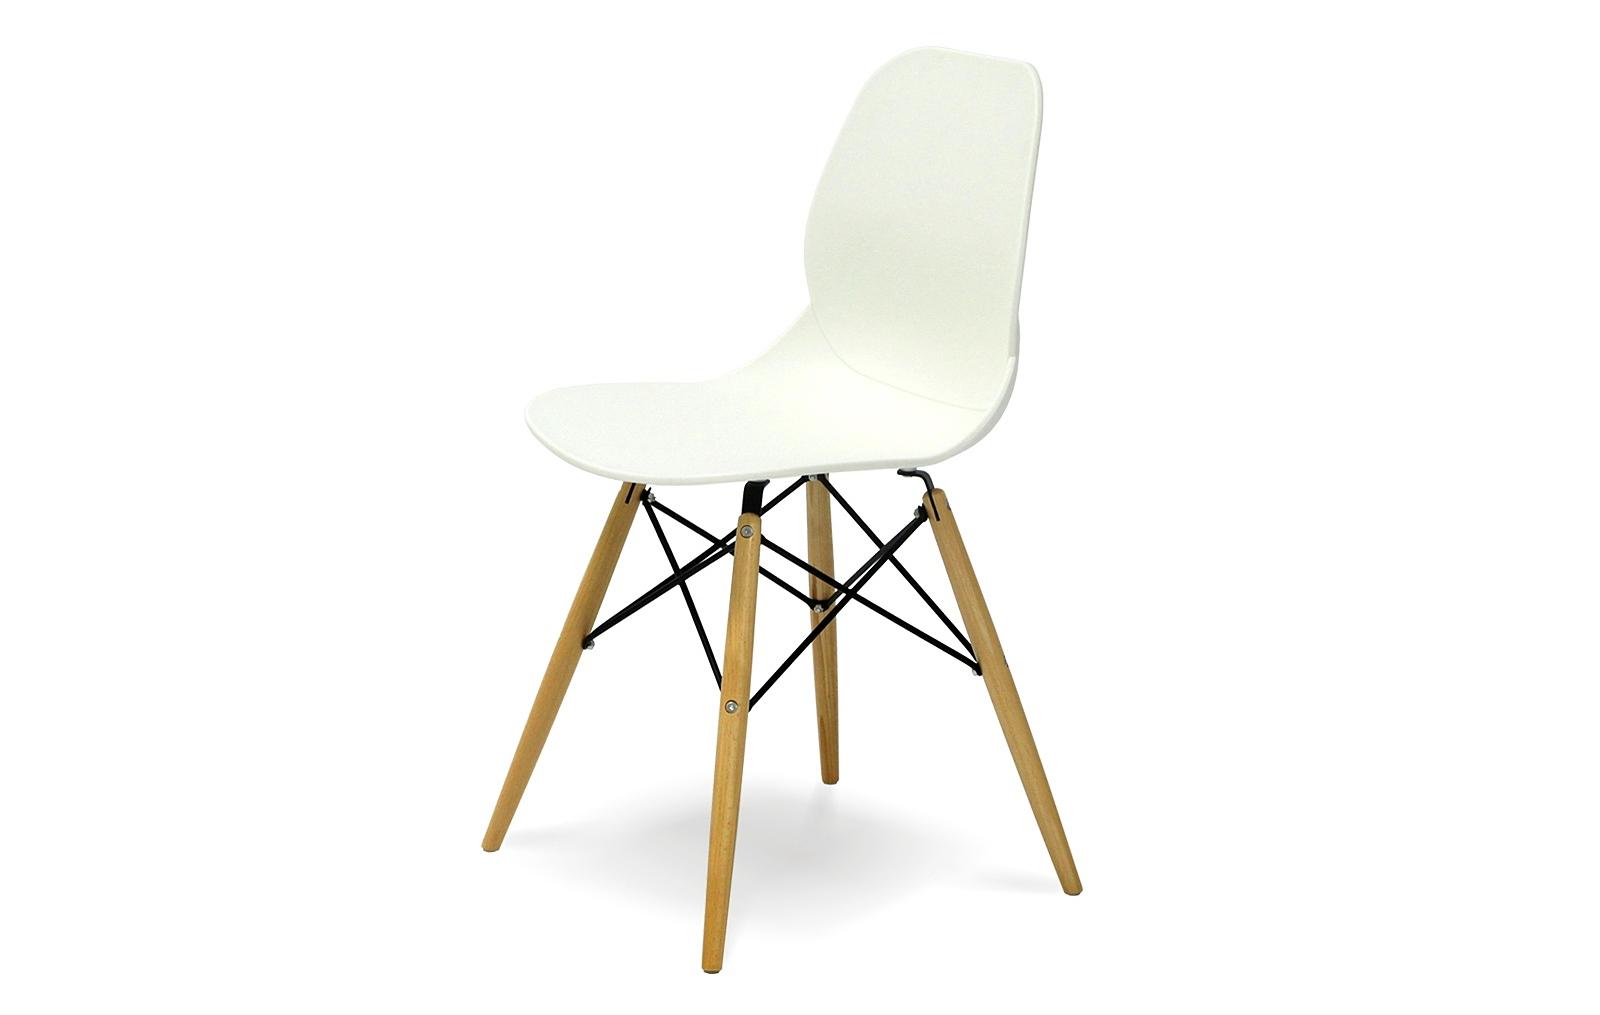 Europe Style Стул PW-025 белый europe style стол dt 903 белый